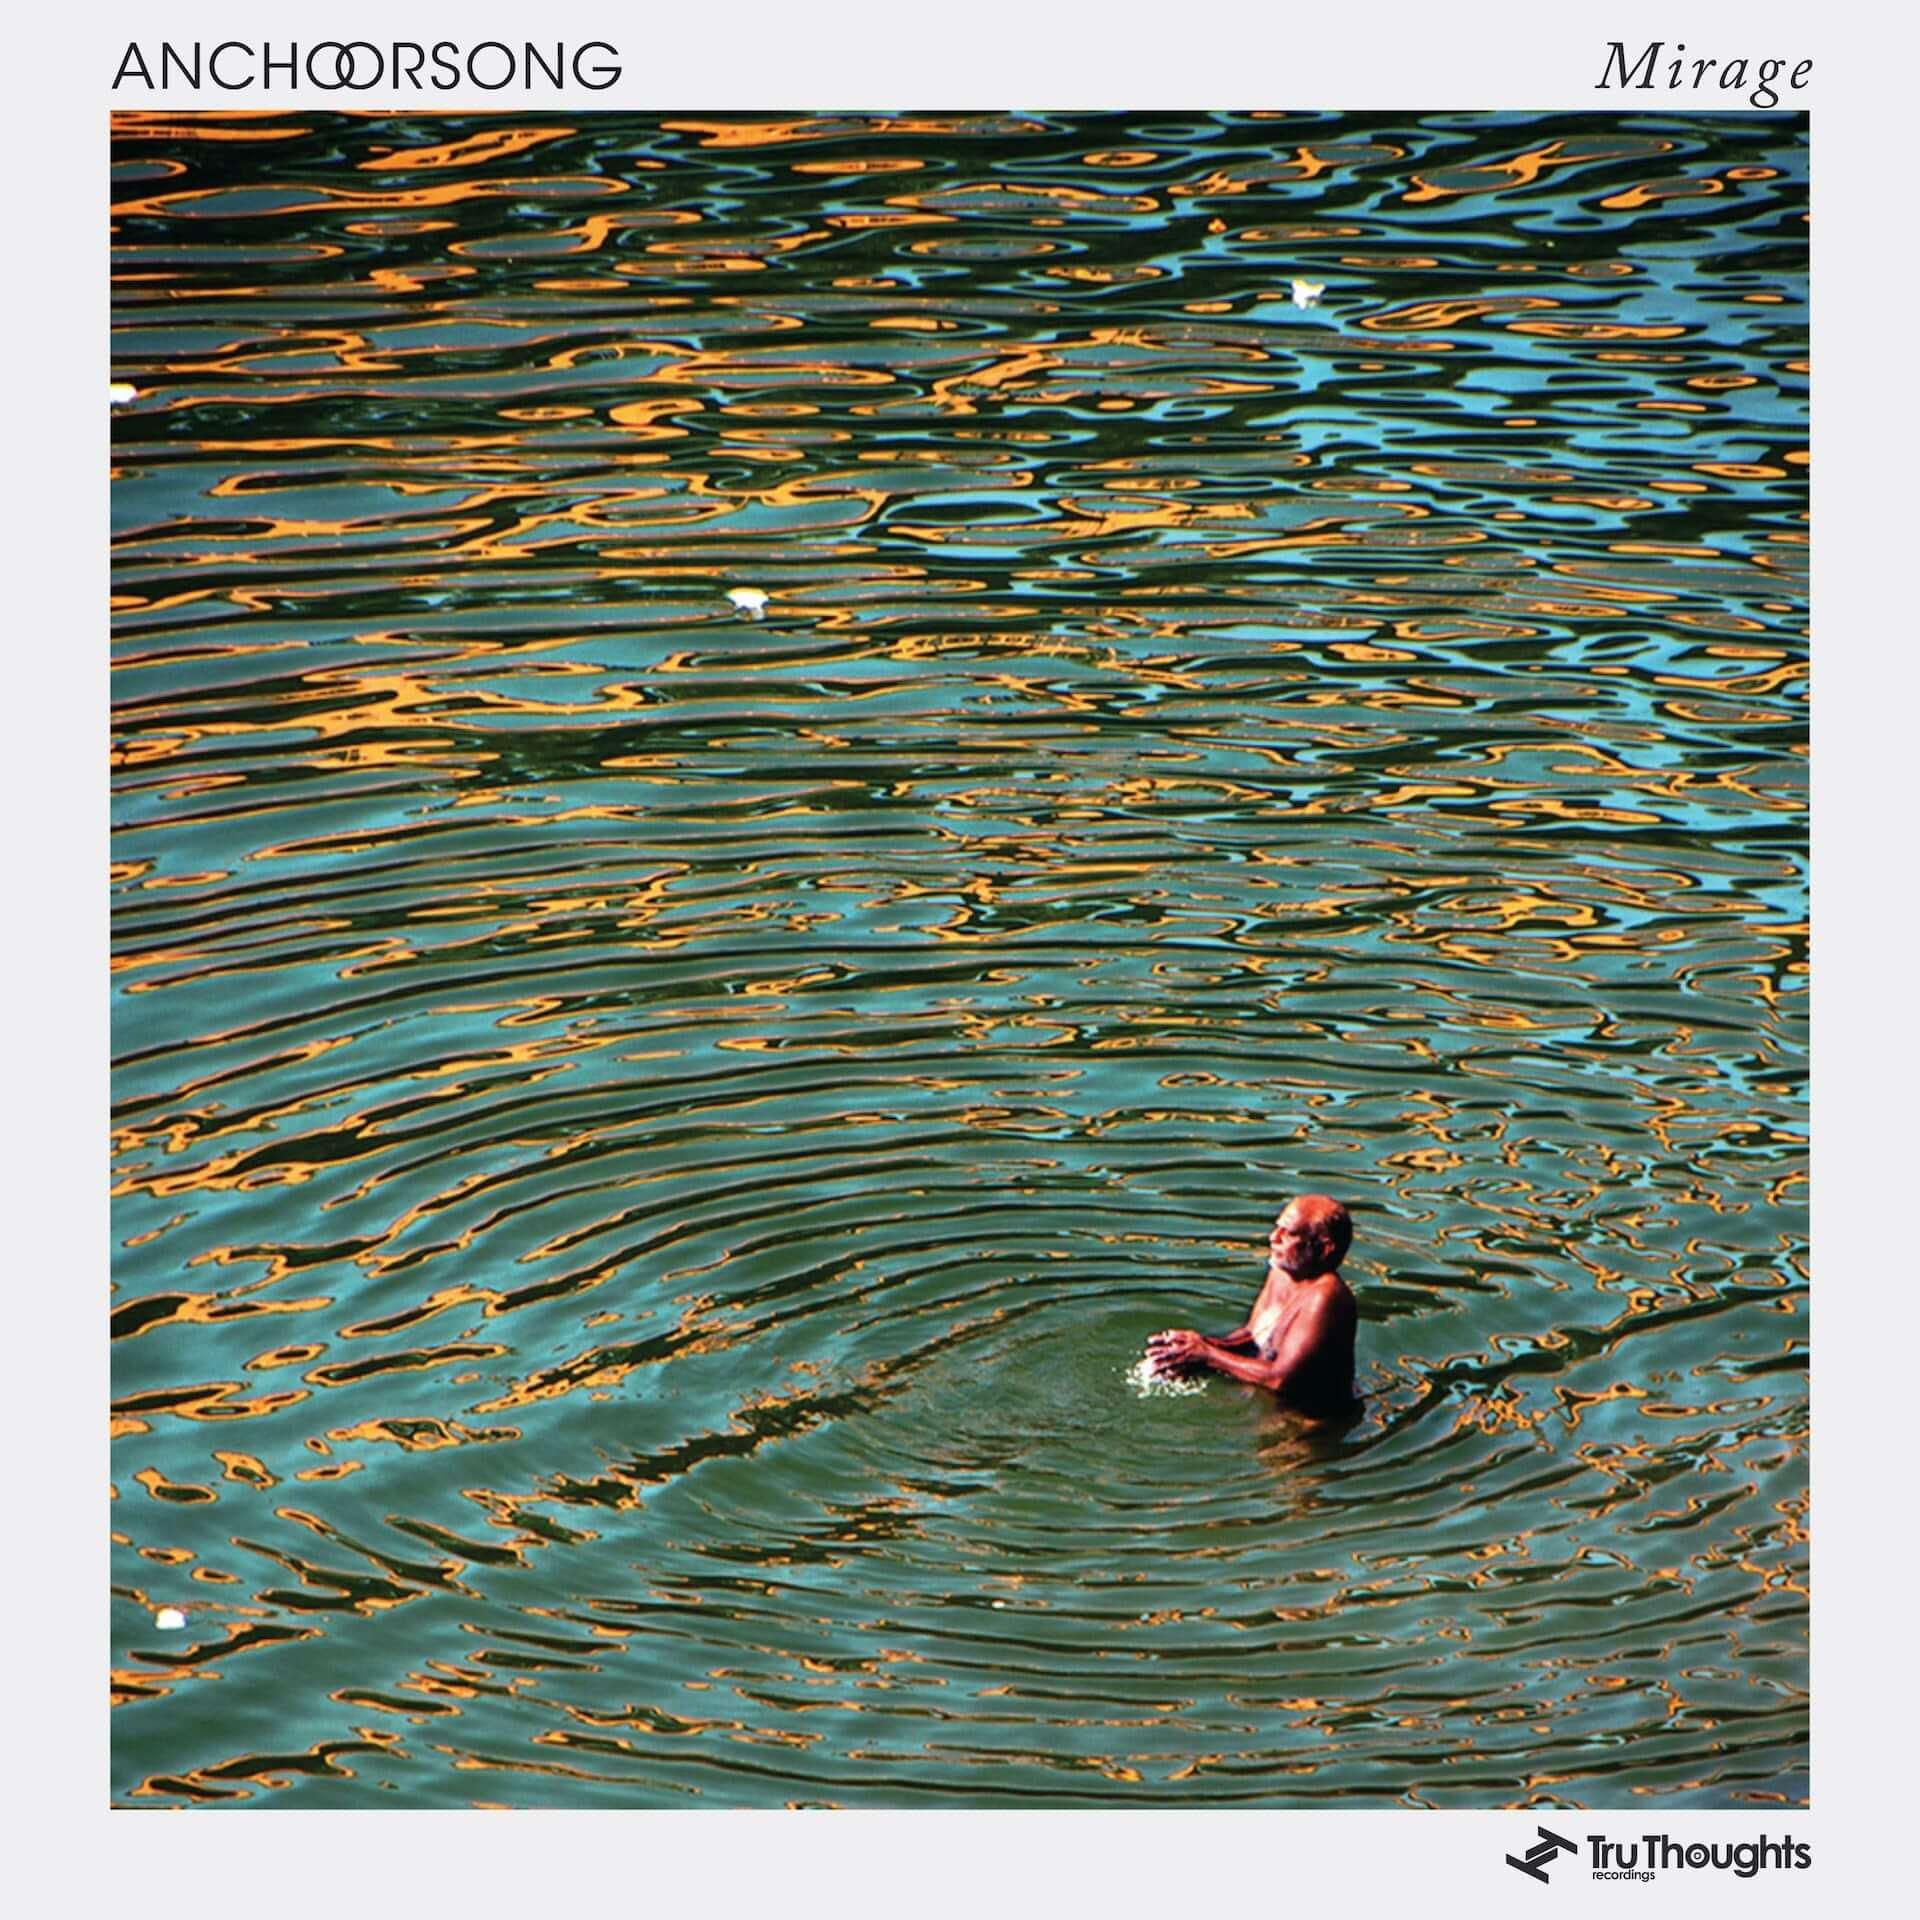 "Anchorsong最新アルバム『Mirage』が〈Tru Thoughts〉からリリース決定!新曲""New World""と本人コメントも公開 music210319_anchorsong_2-2-1920x1920"